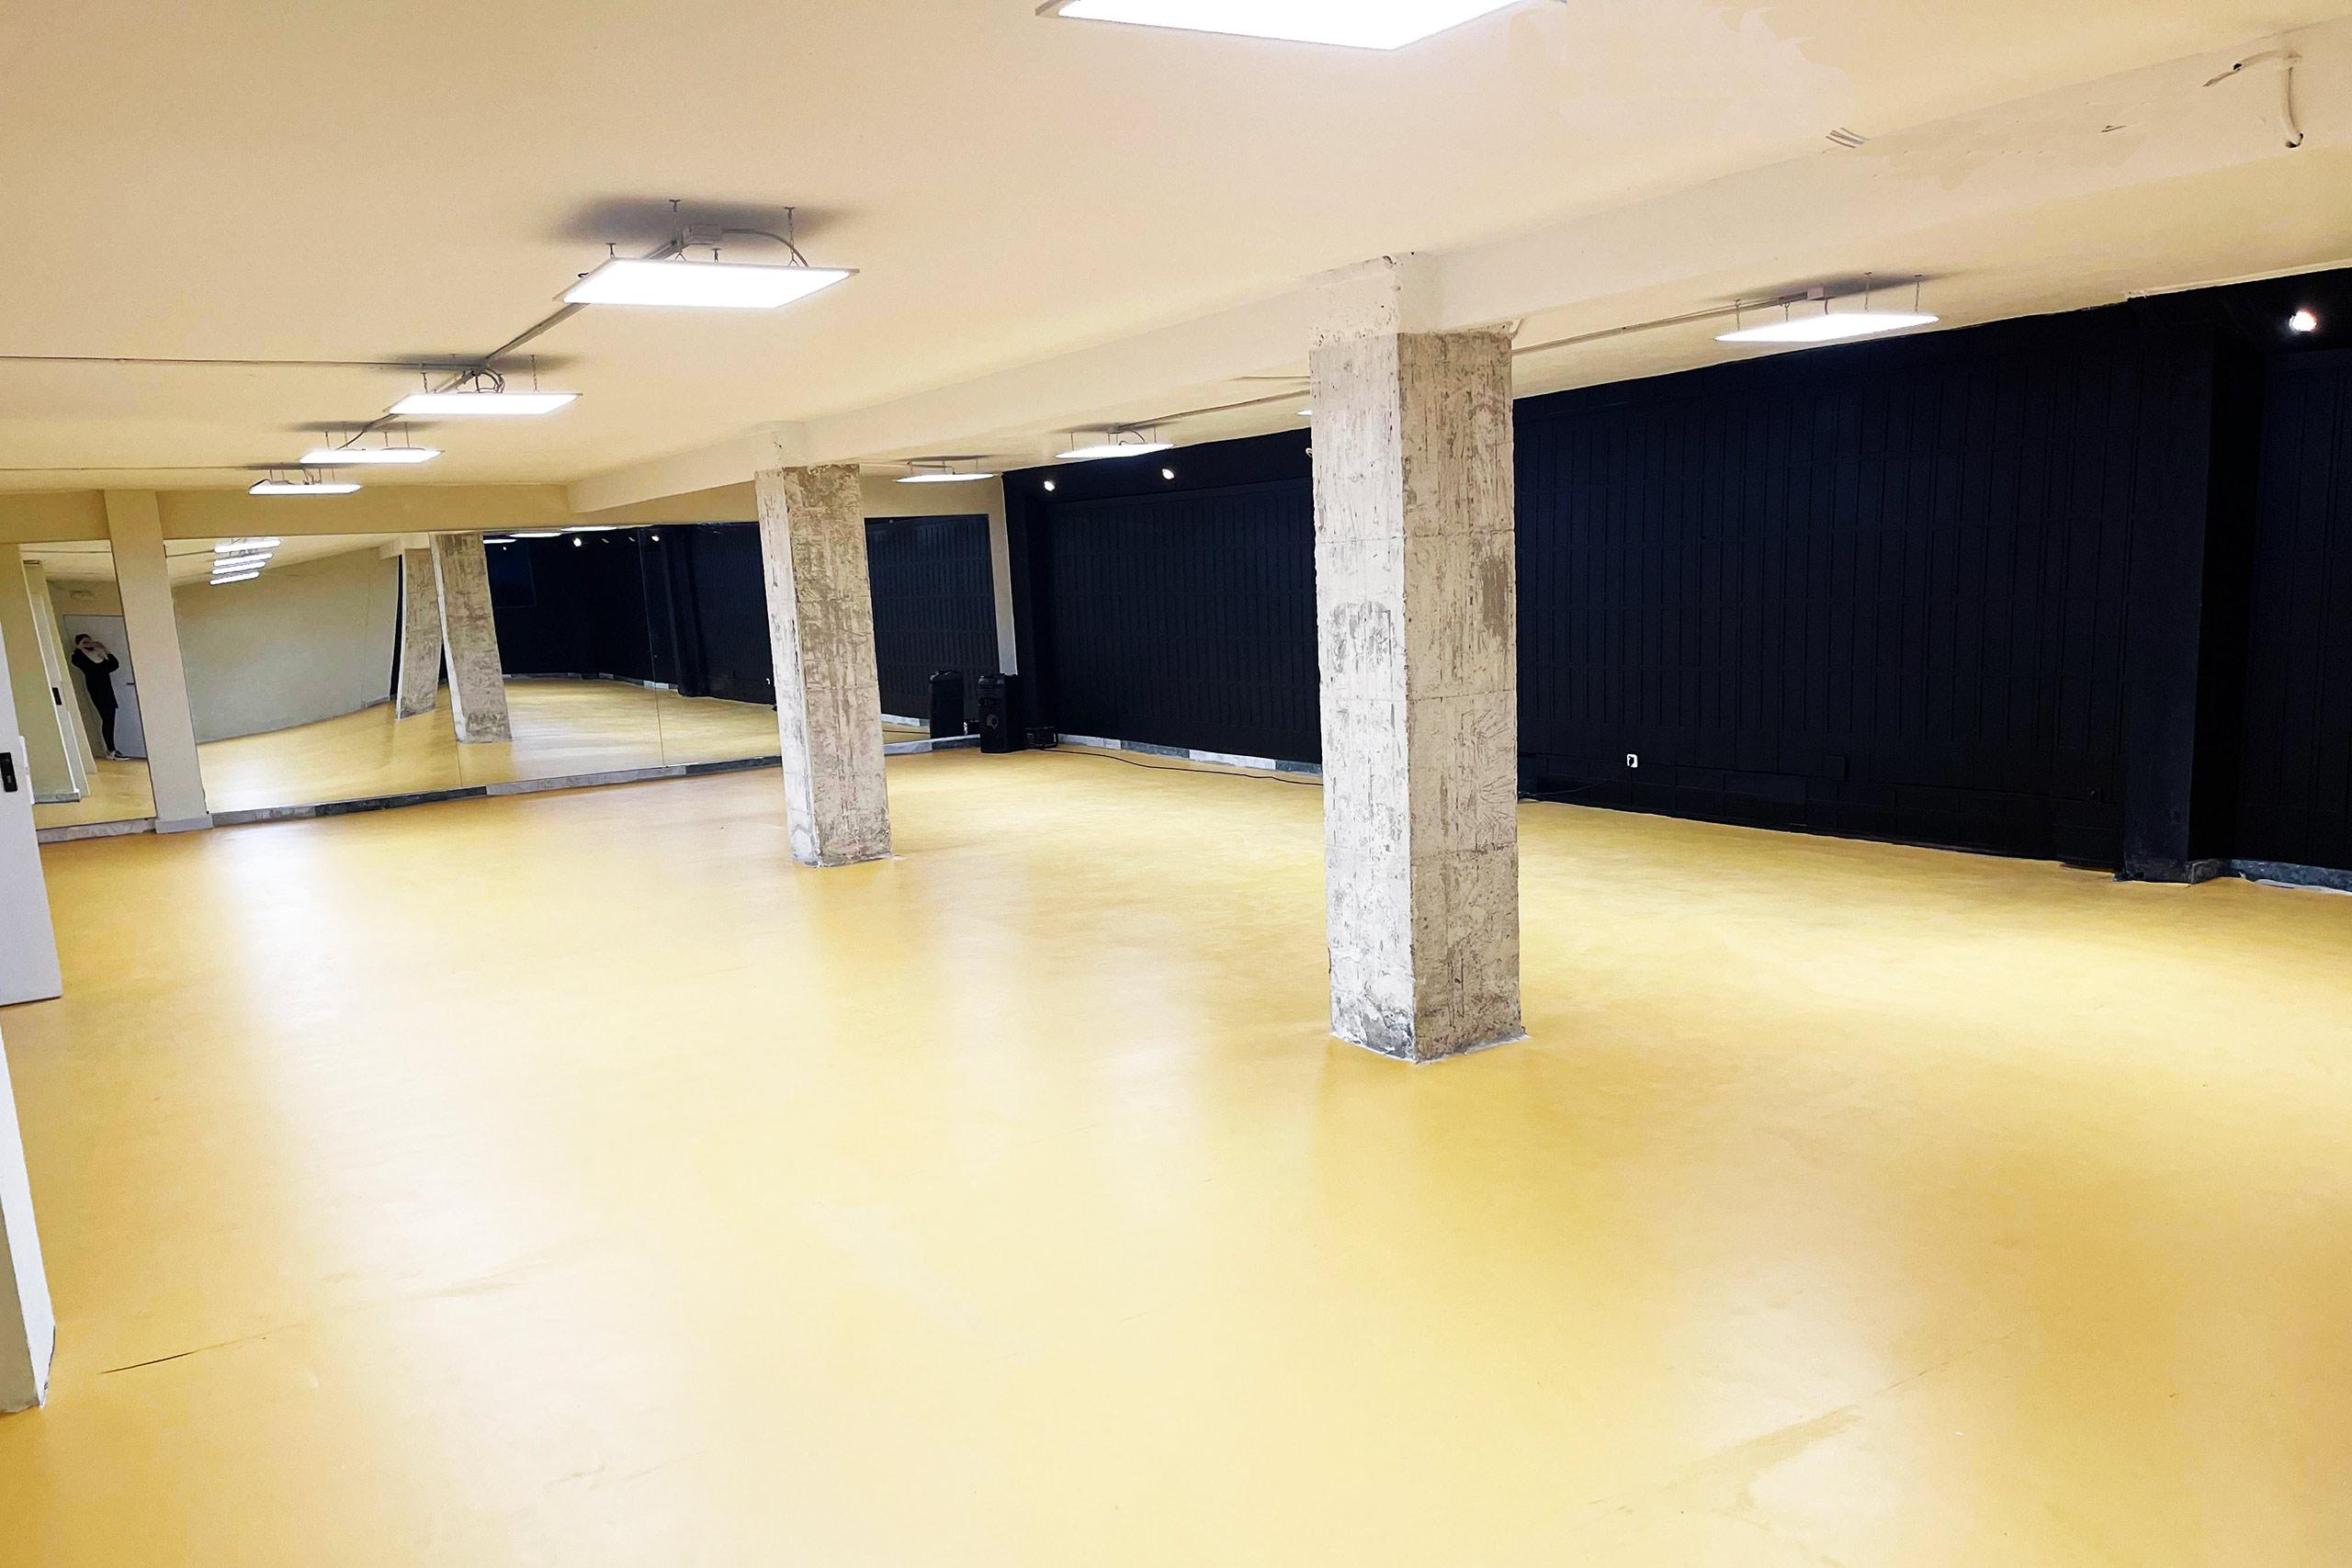 sala-grande-1-Baile---Tempo-Musical